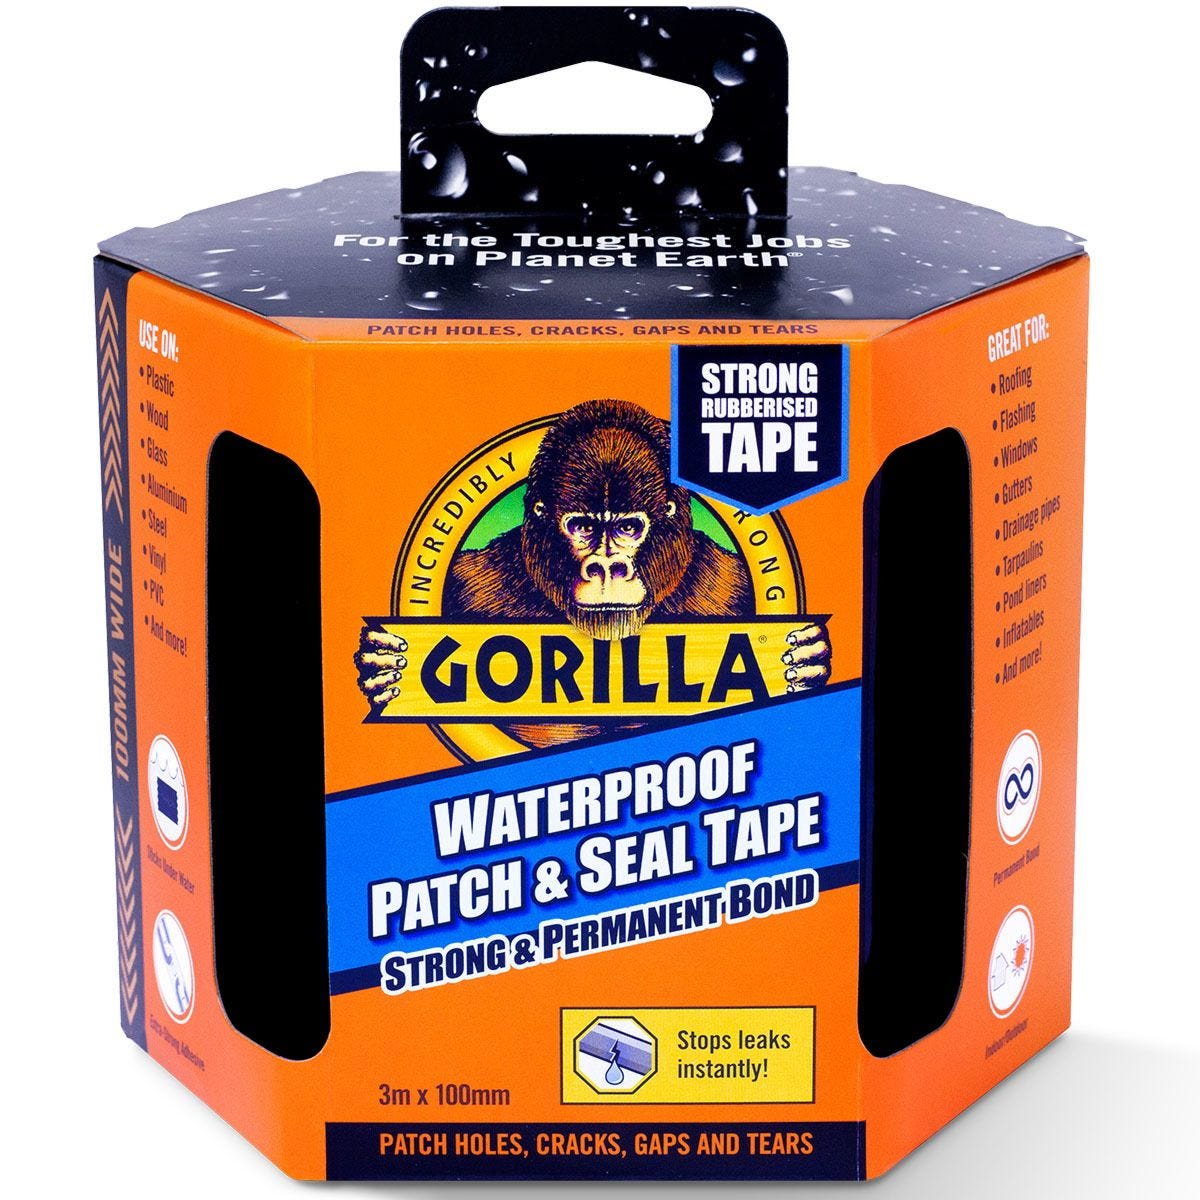 Gorilla Waterproof Patch & Seal Tape - 3m x 100mm